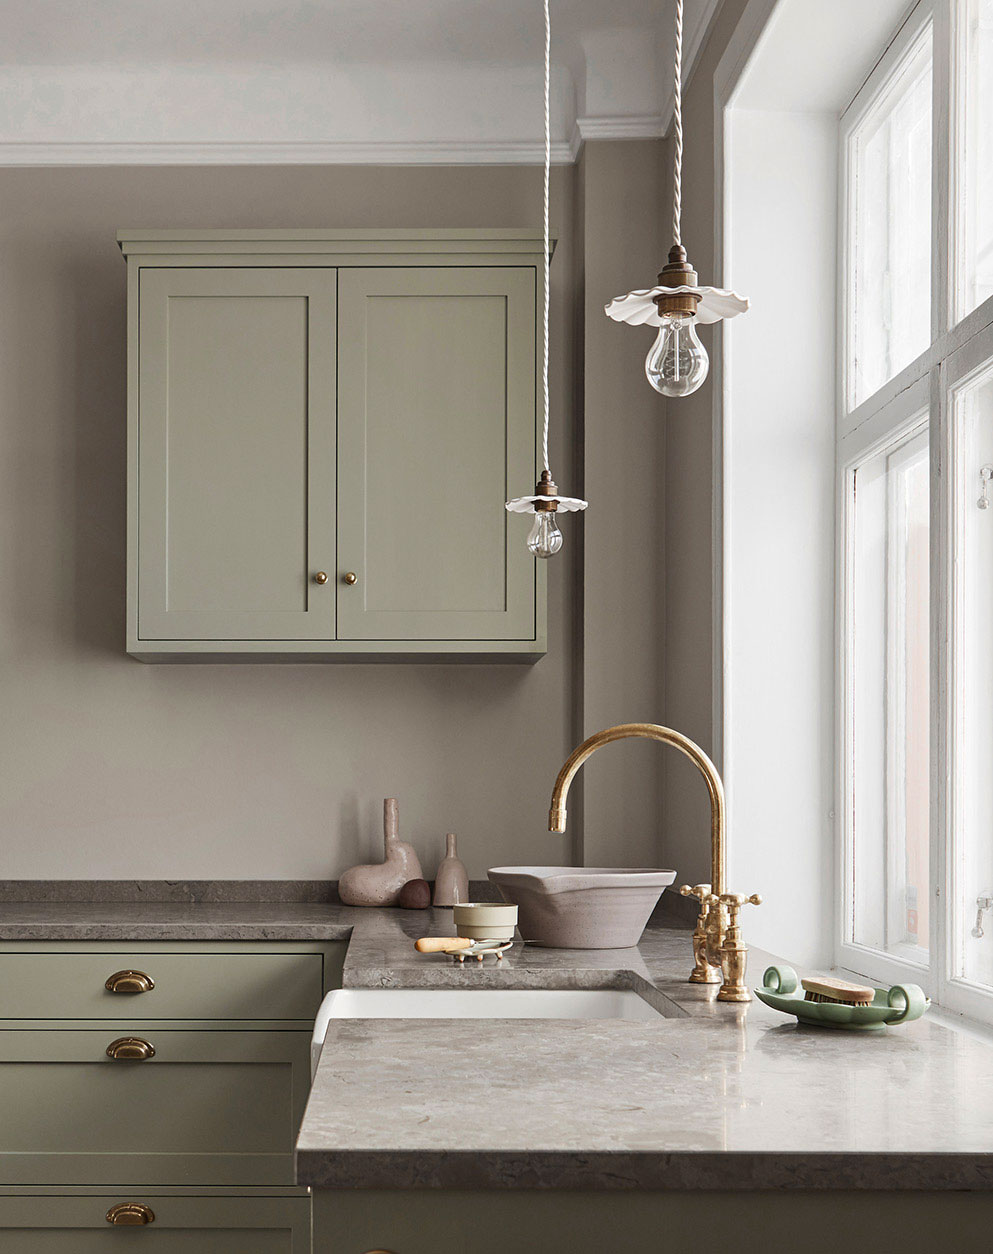 How To Do Classic Shaker Kitchens The Scandinavian Way Nordic Design